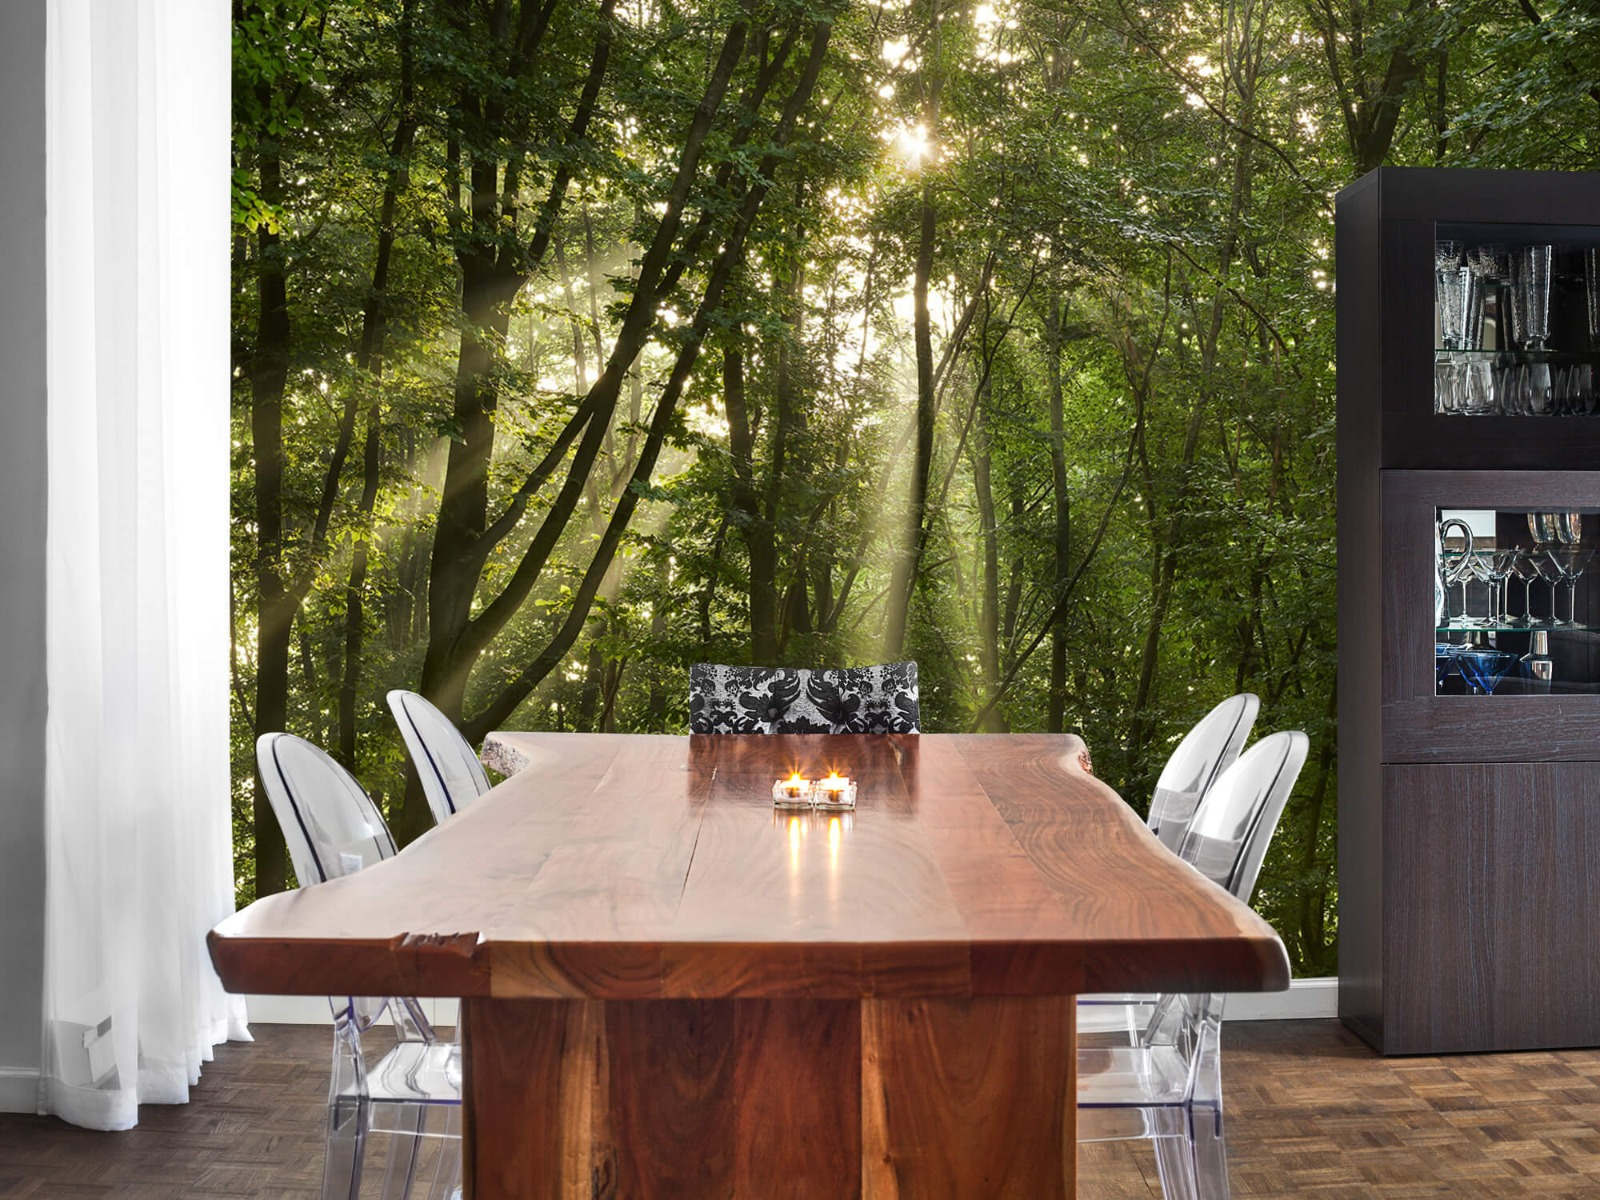 Bomen - Zonnestralen in het bos - Slaapkamer 2